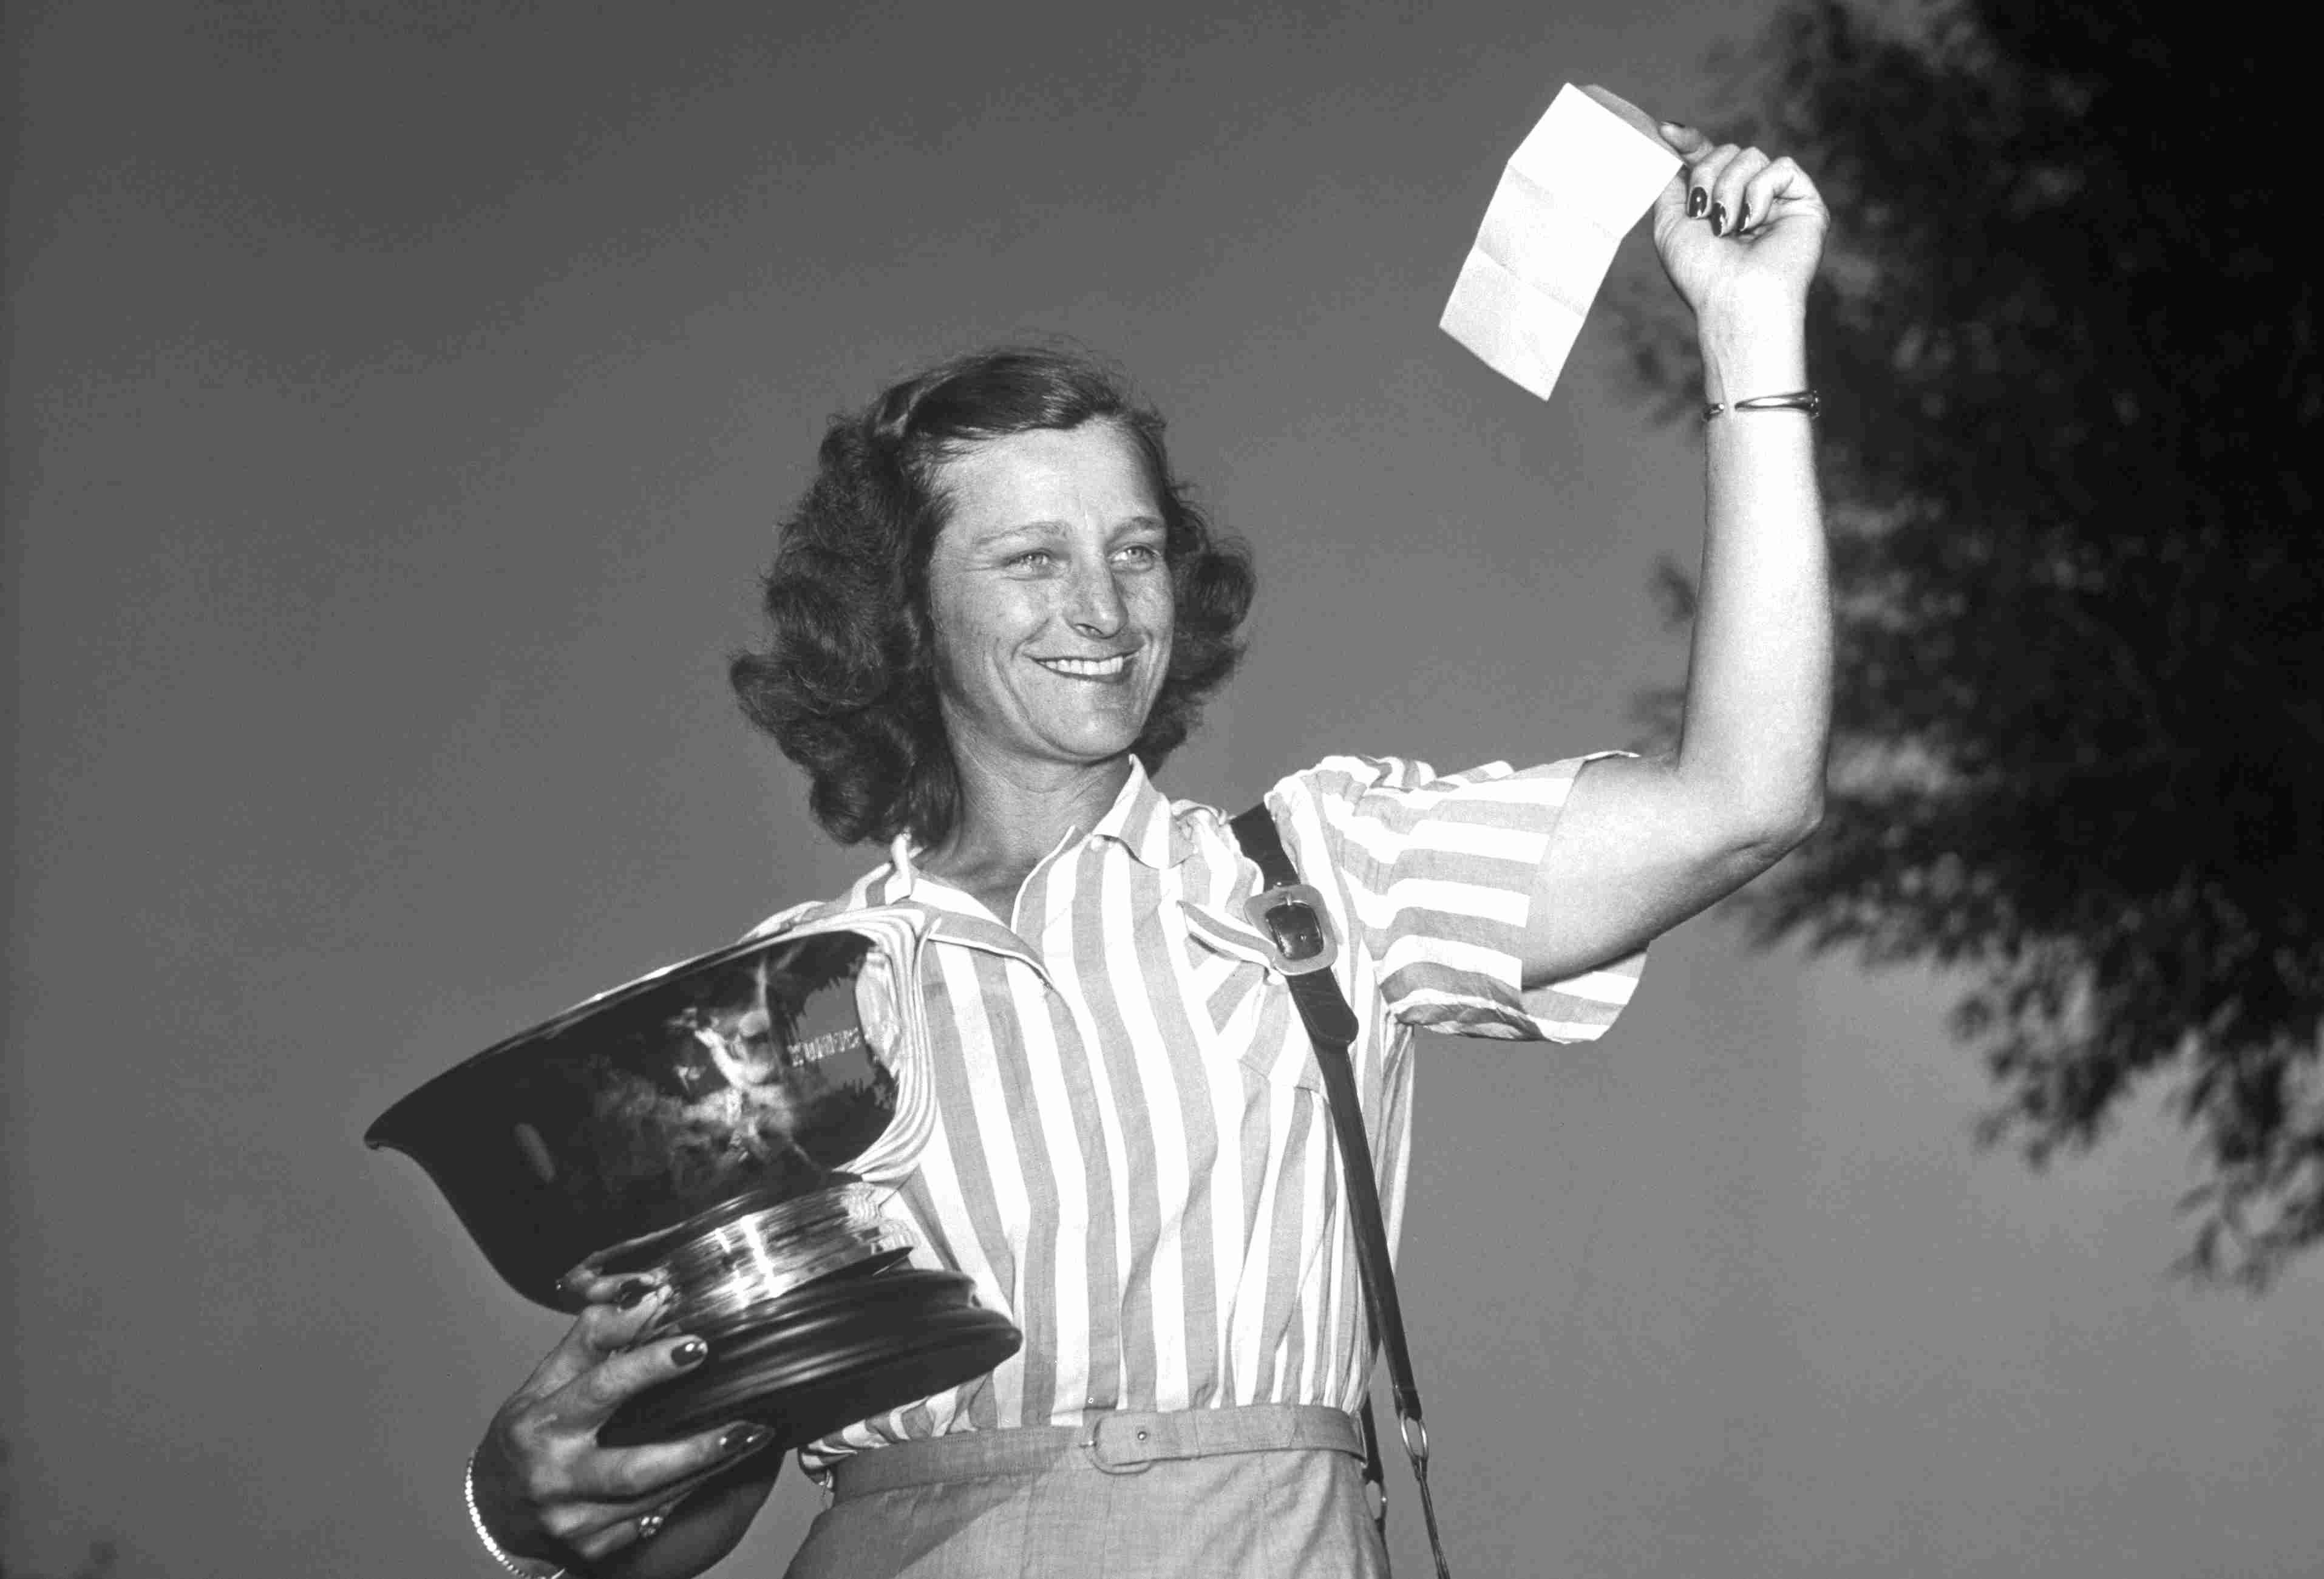 One of the LPGA's founders, Babe Didrikson Zaharias